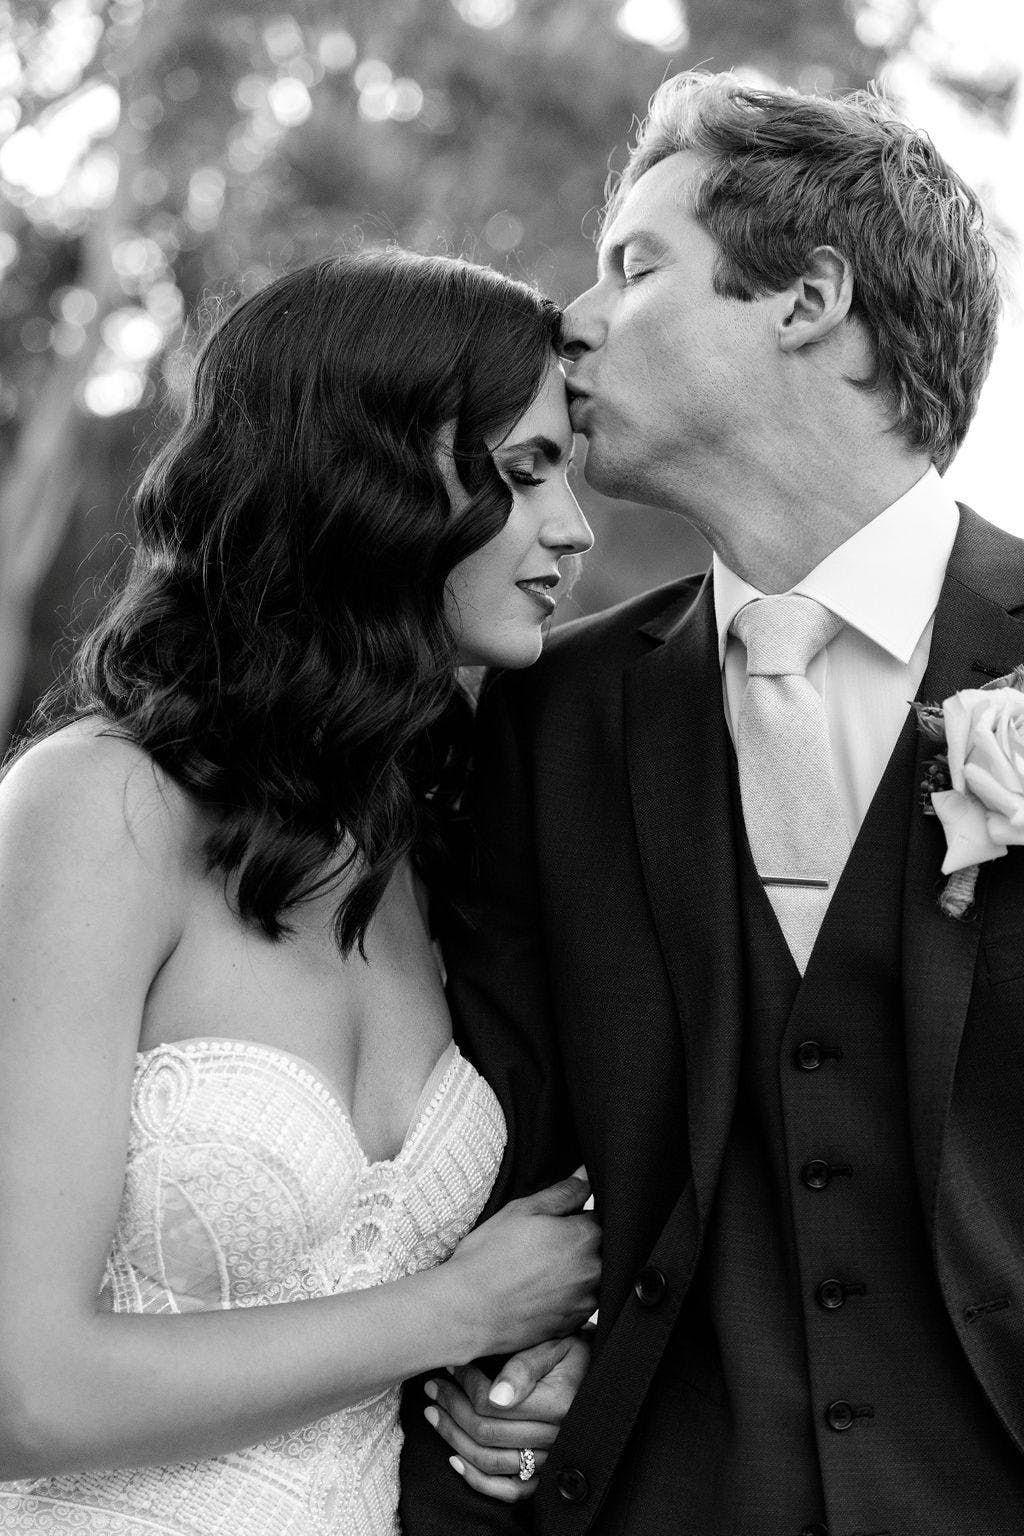 Mornington Peninsula Wedding Photographer Stillwater at Crittenden - Mornington Peninsula Wedding Photographer